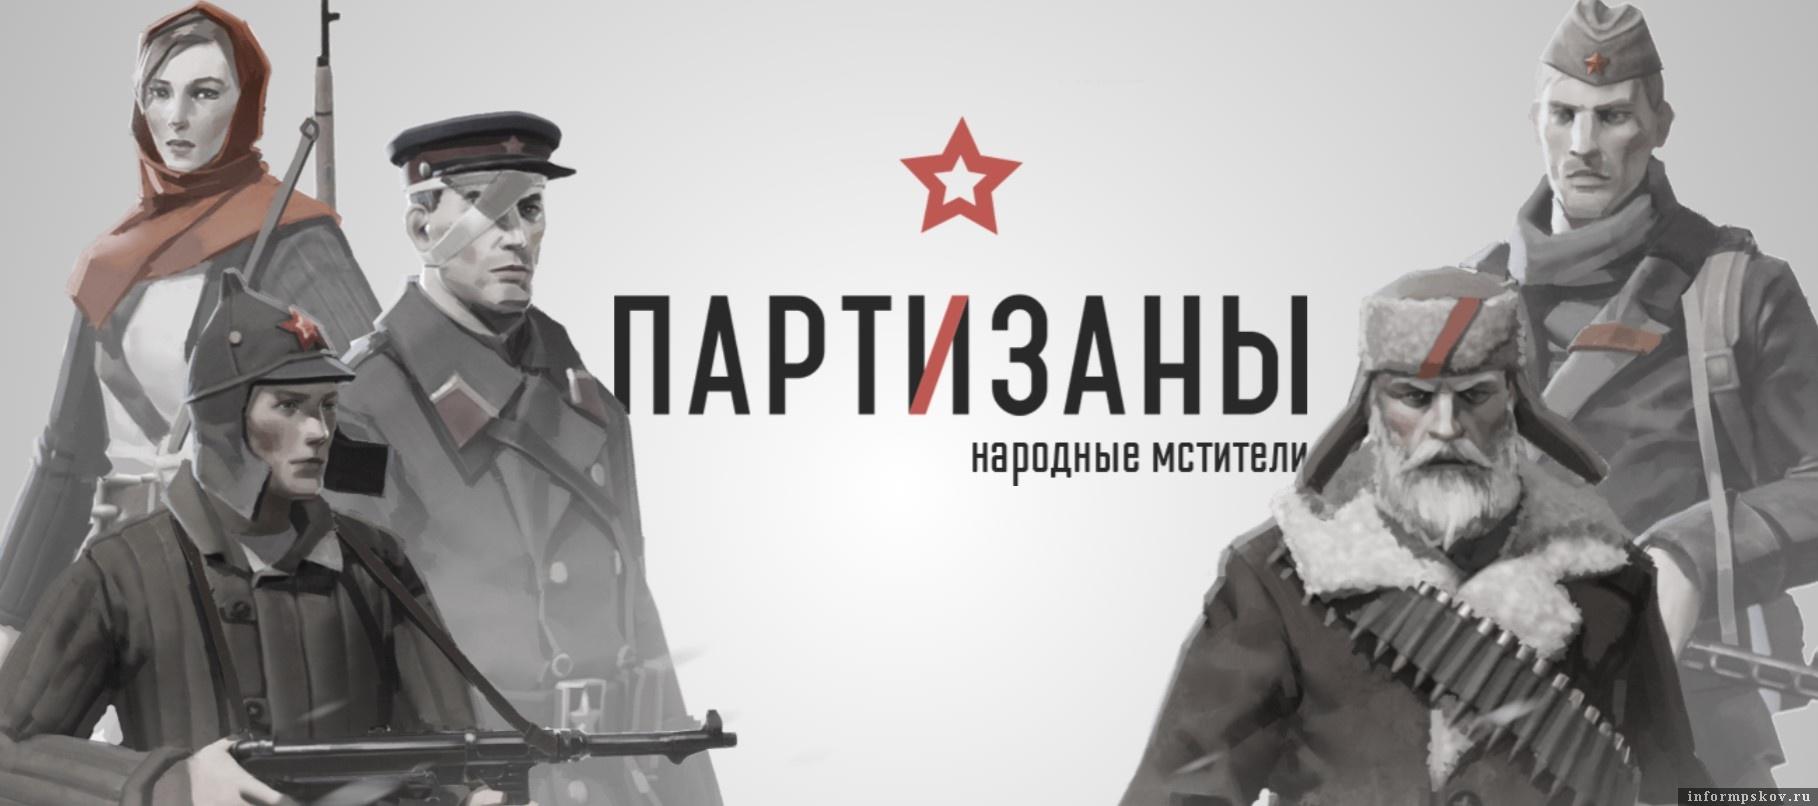 Партизаны 1941 © Alter Games